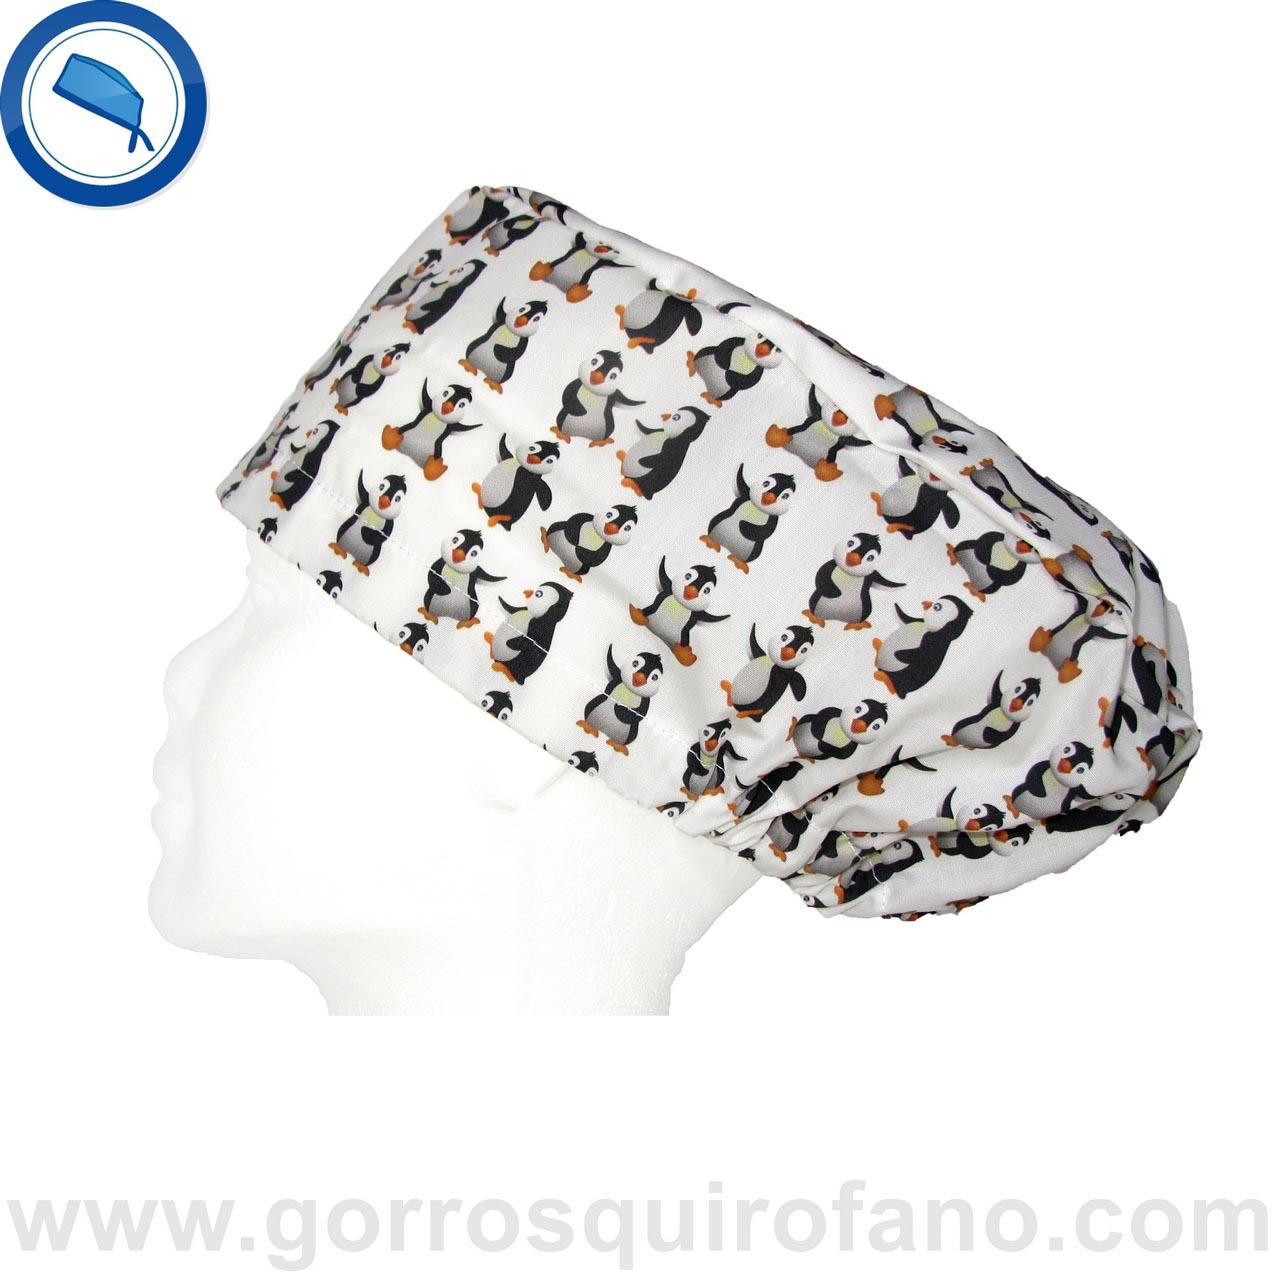 Gorros Quirofano Personalizados Diseños creados por usuarios 3